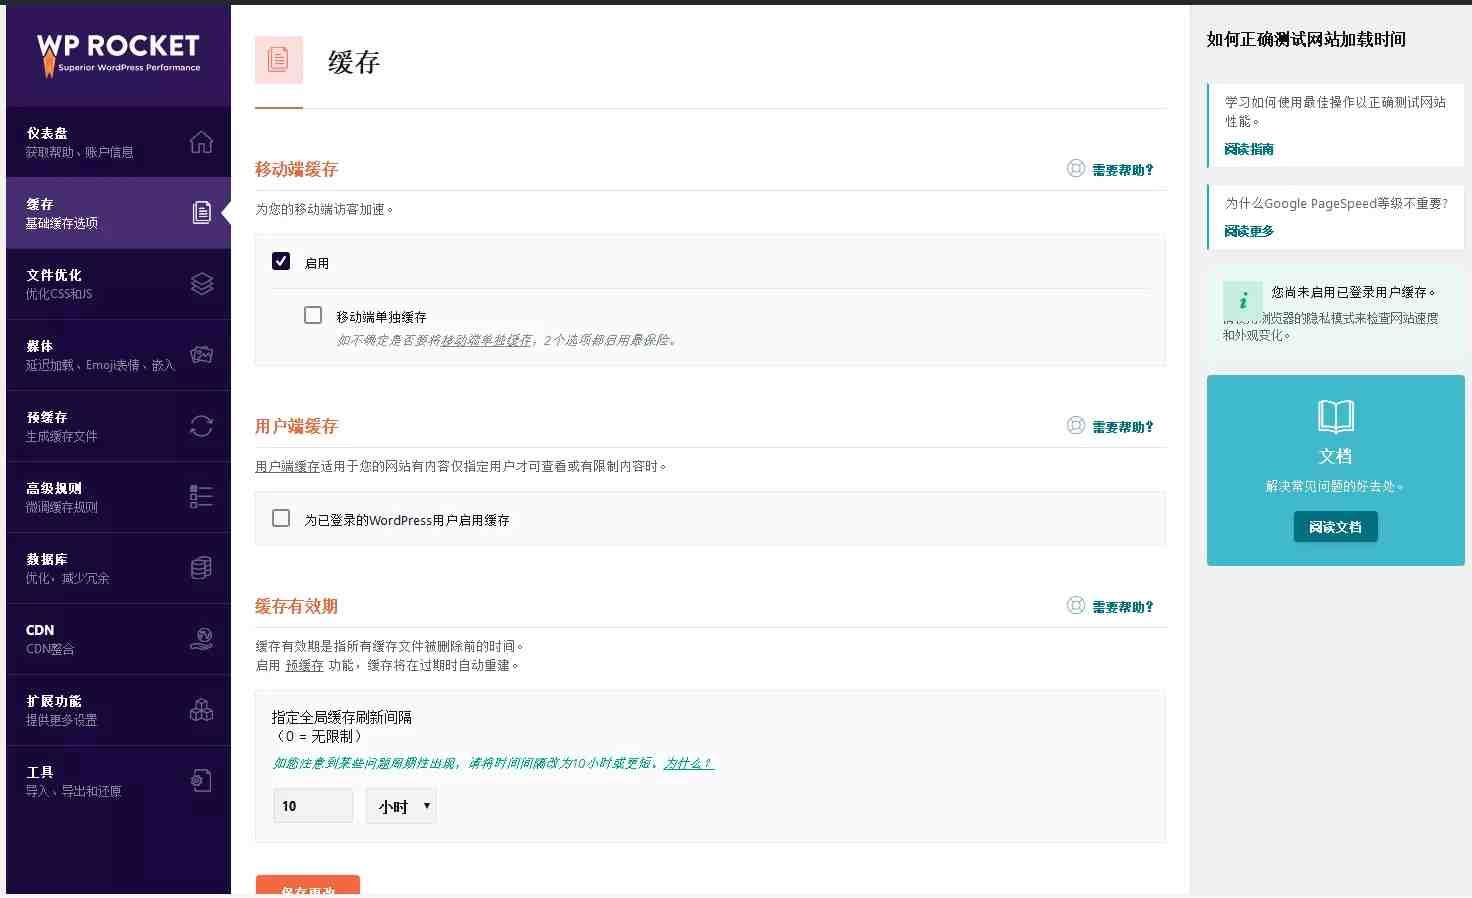 【WP缓存插件】Rocket汉化版WP超强缓存插件已更新至V3.5.4[WordPress插件]-找主题源码